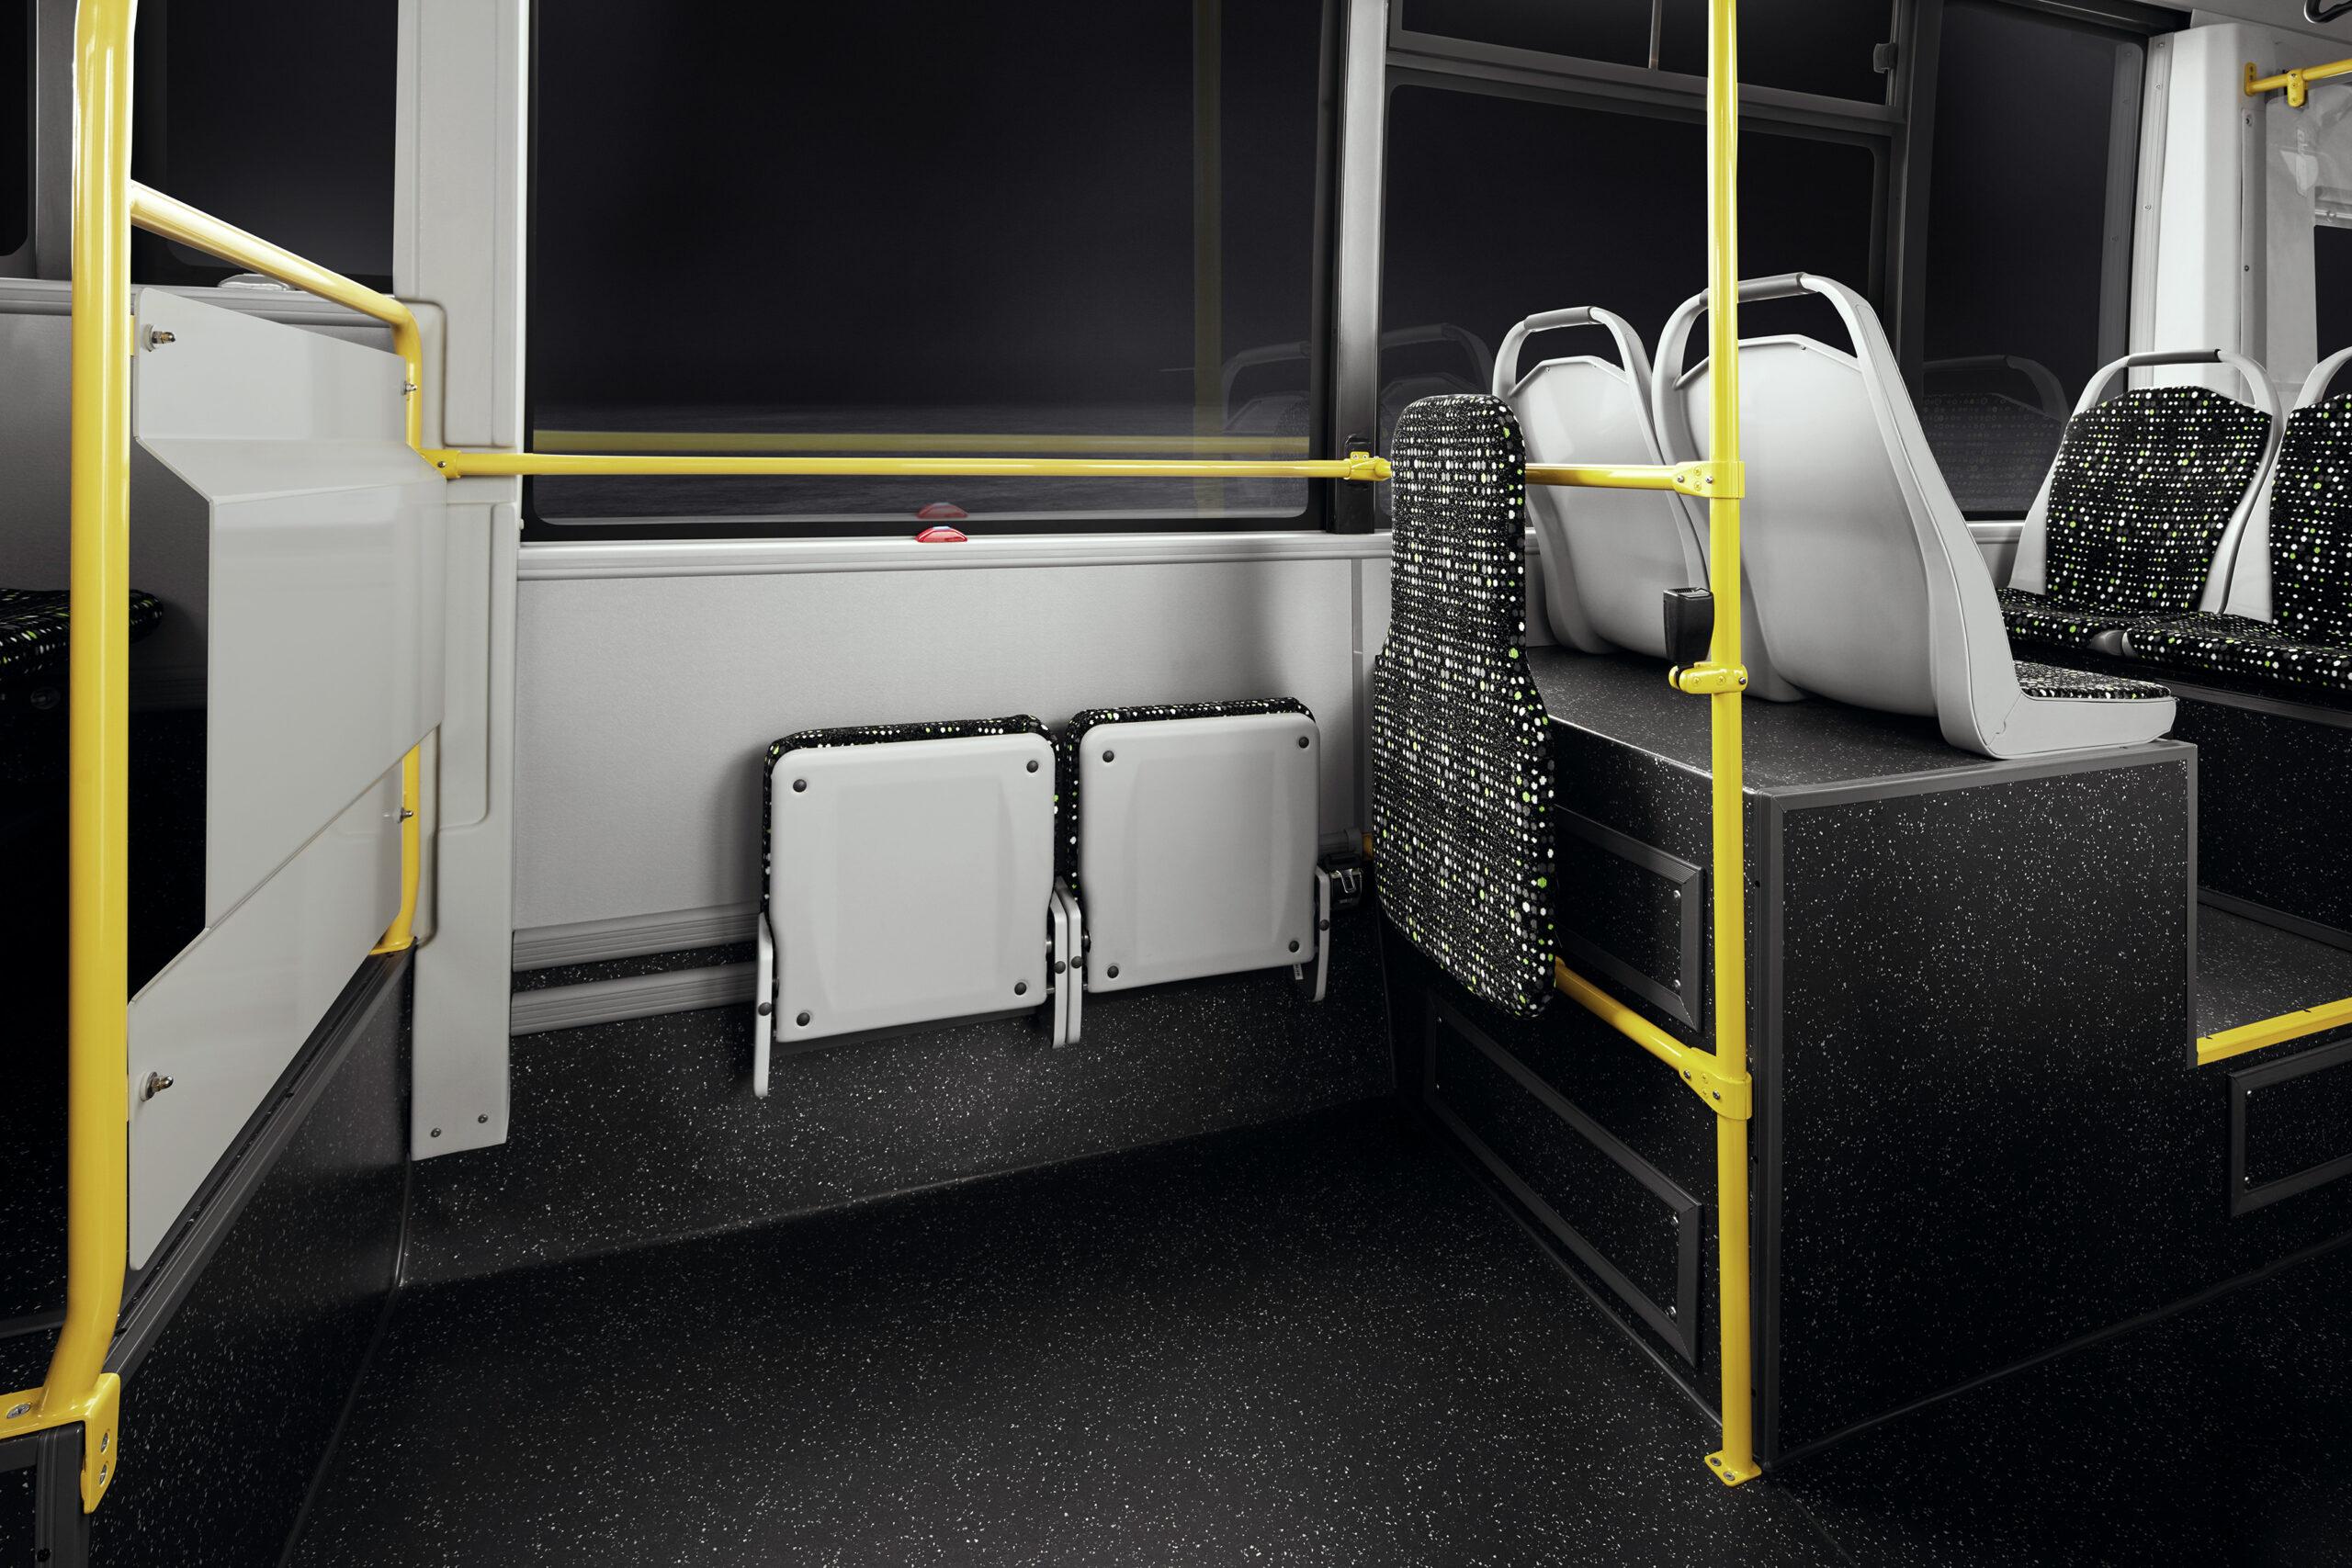 MD9 Electricity _tekerlekli sandalye